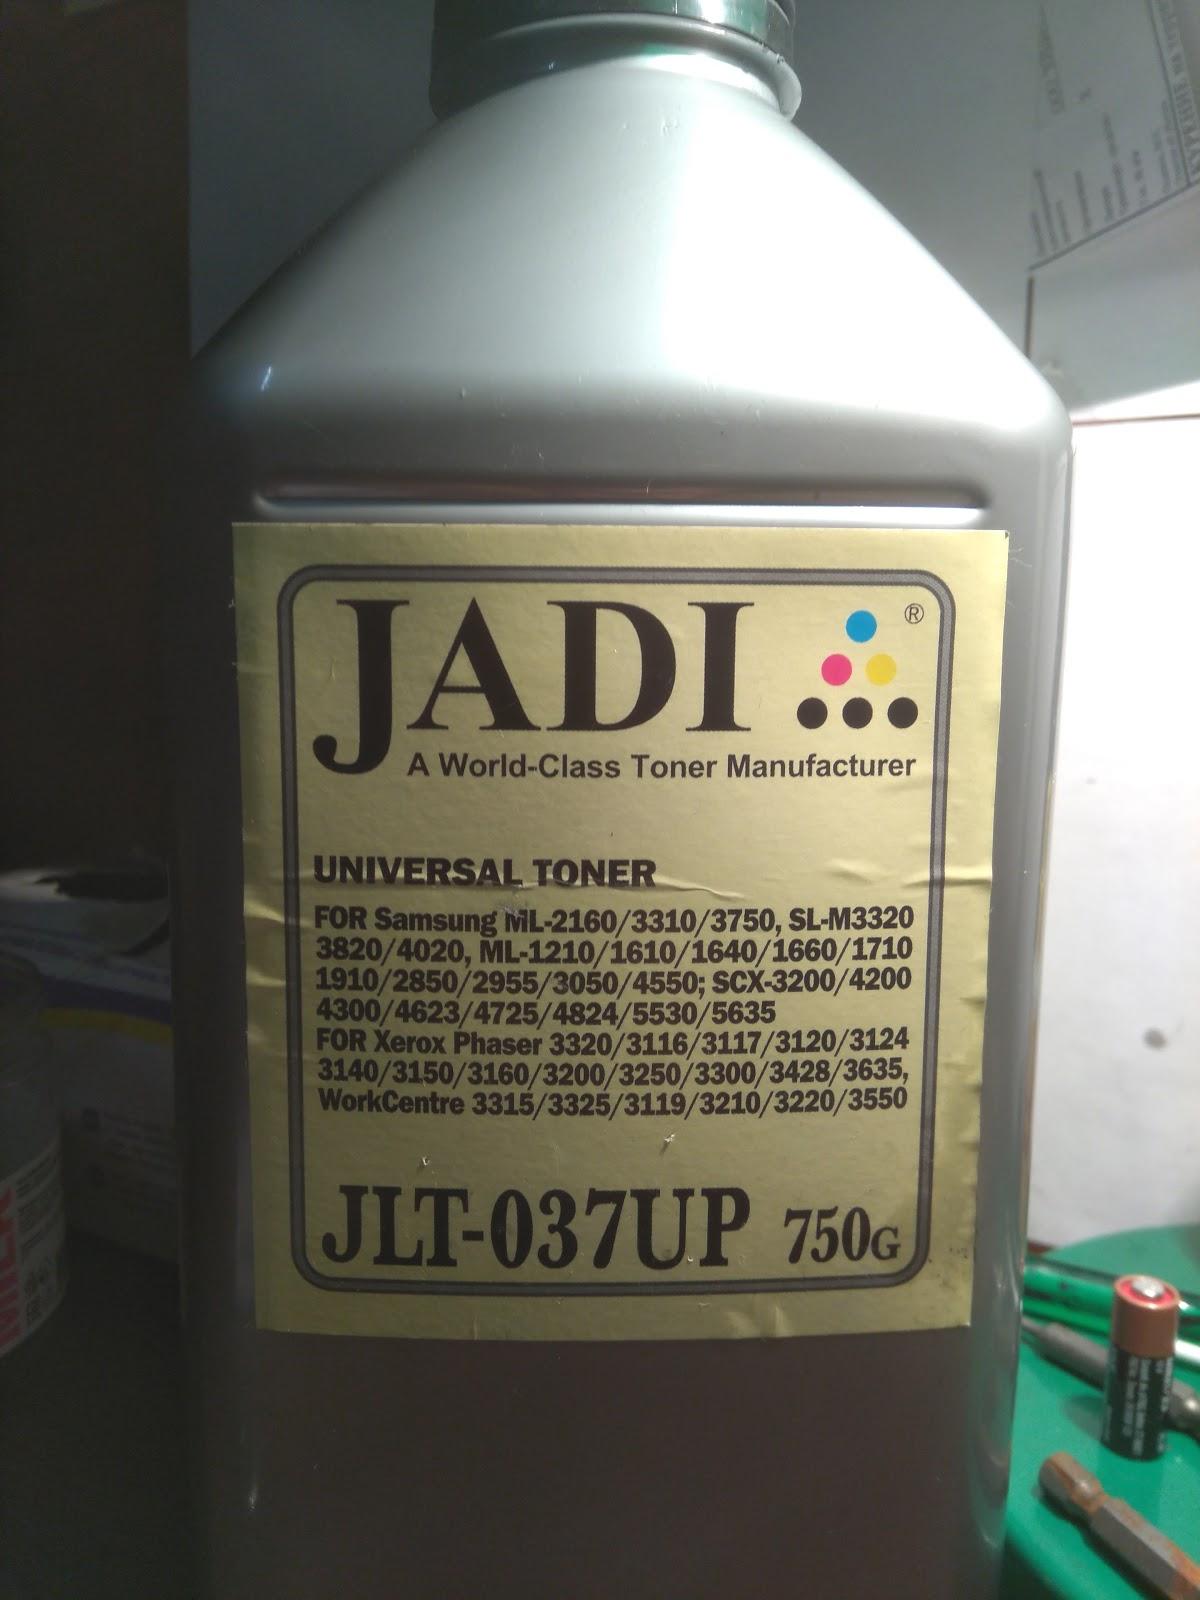 Samsung JADI JLT-037UP